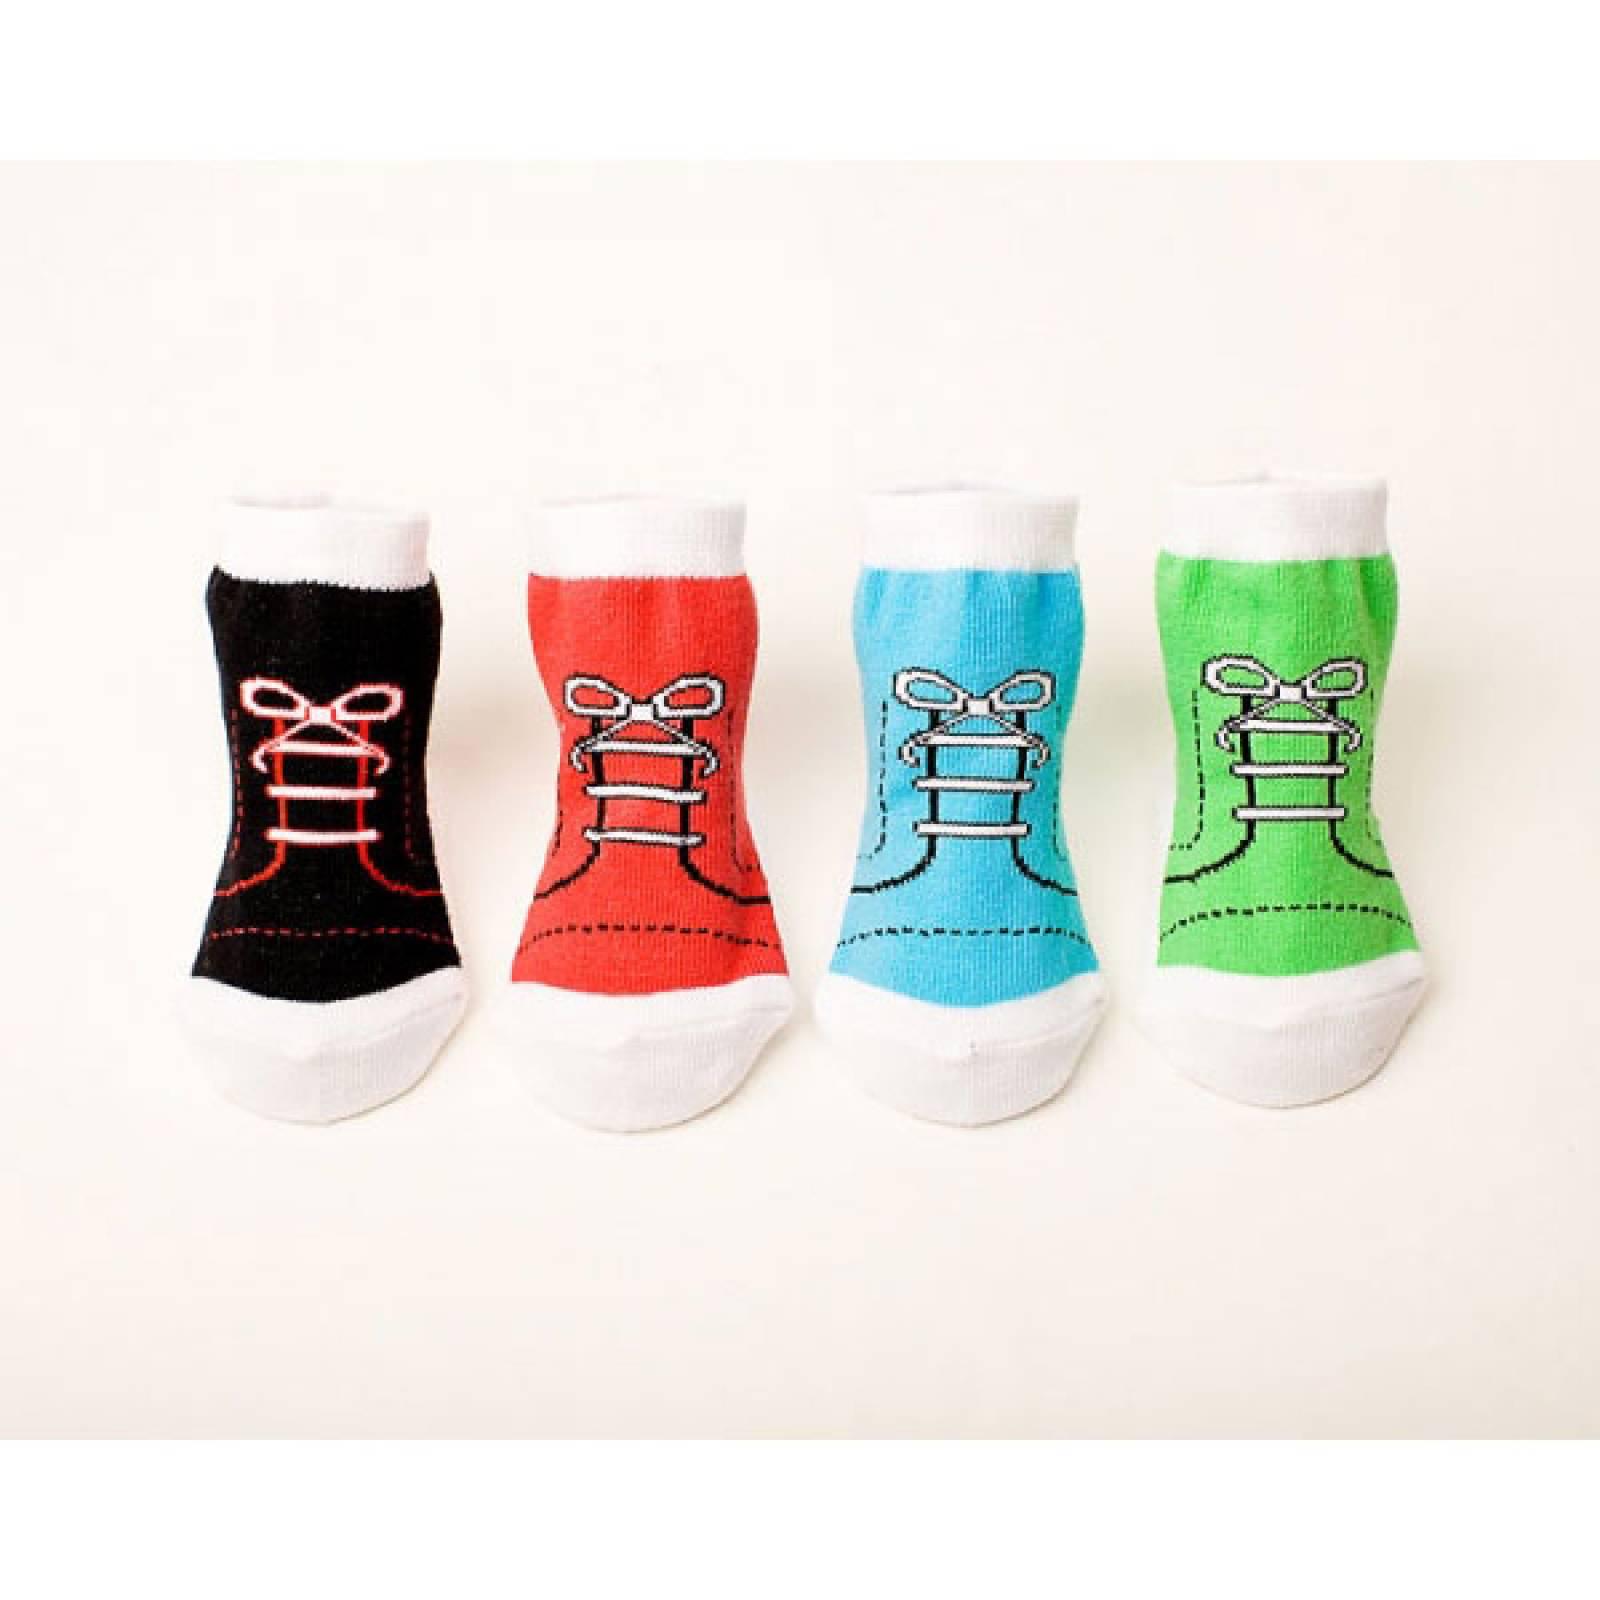 Ultra Cool High Top Baby Socks Set Of 4